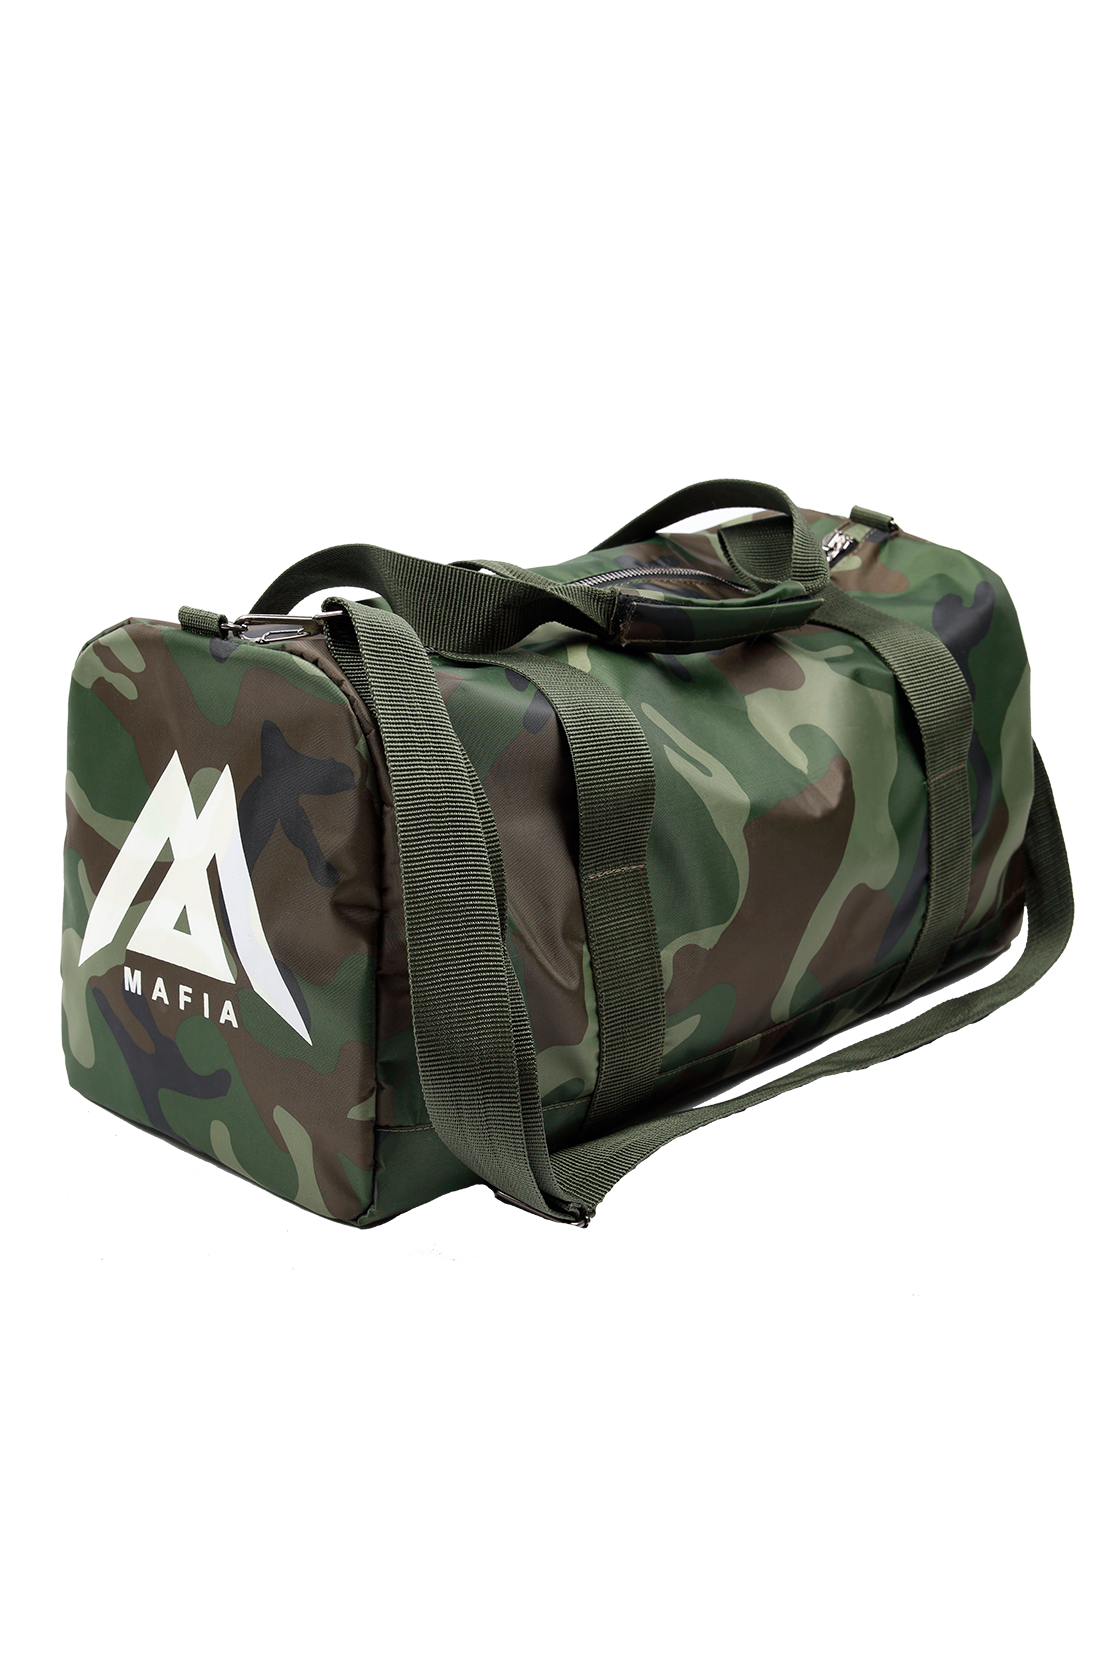 Unisex Sports bag Black Star Mafia